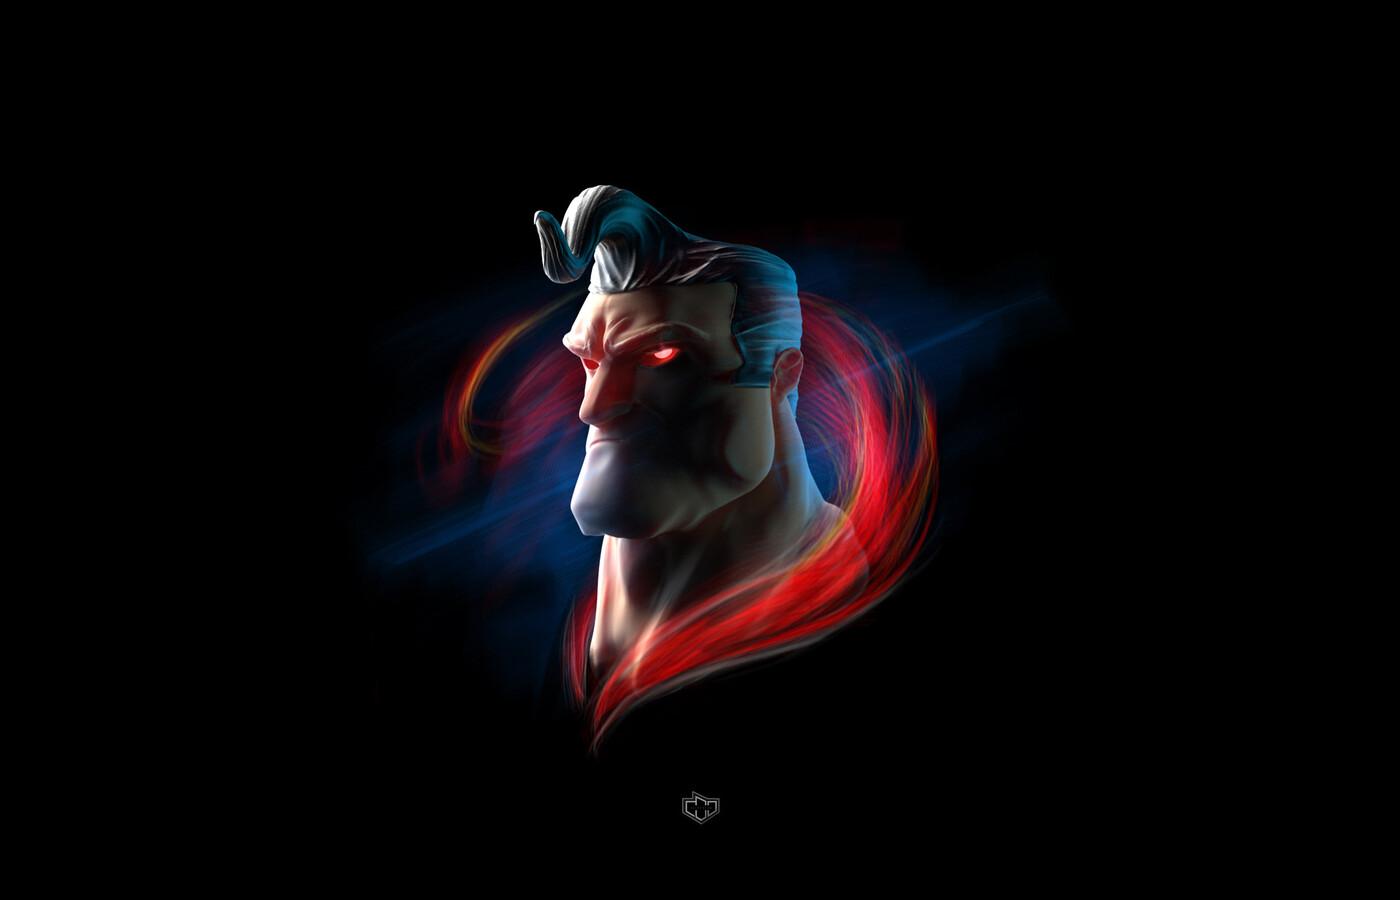 superman-cartoonic-art-be.jpg